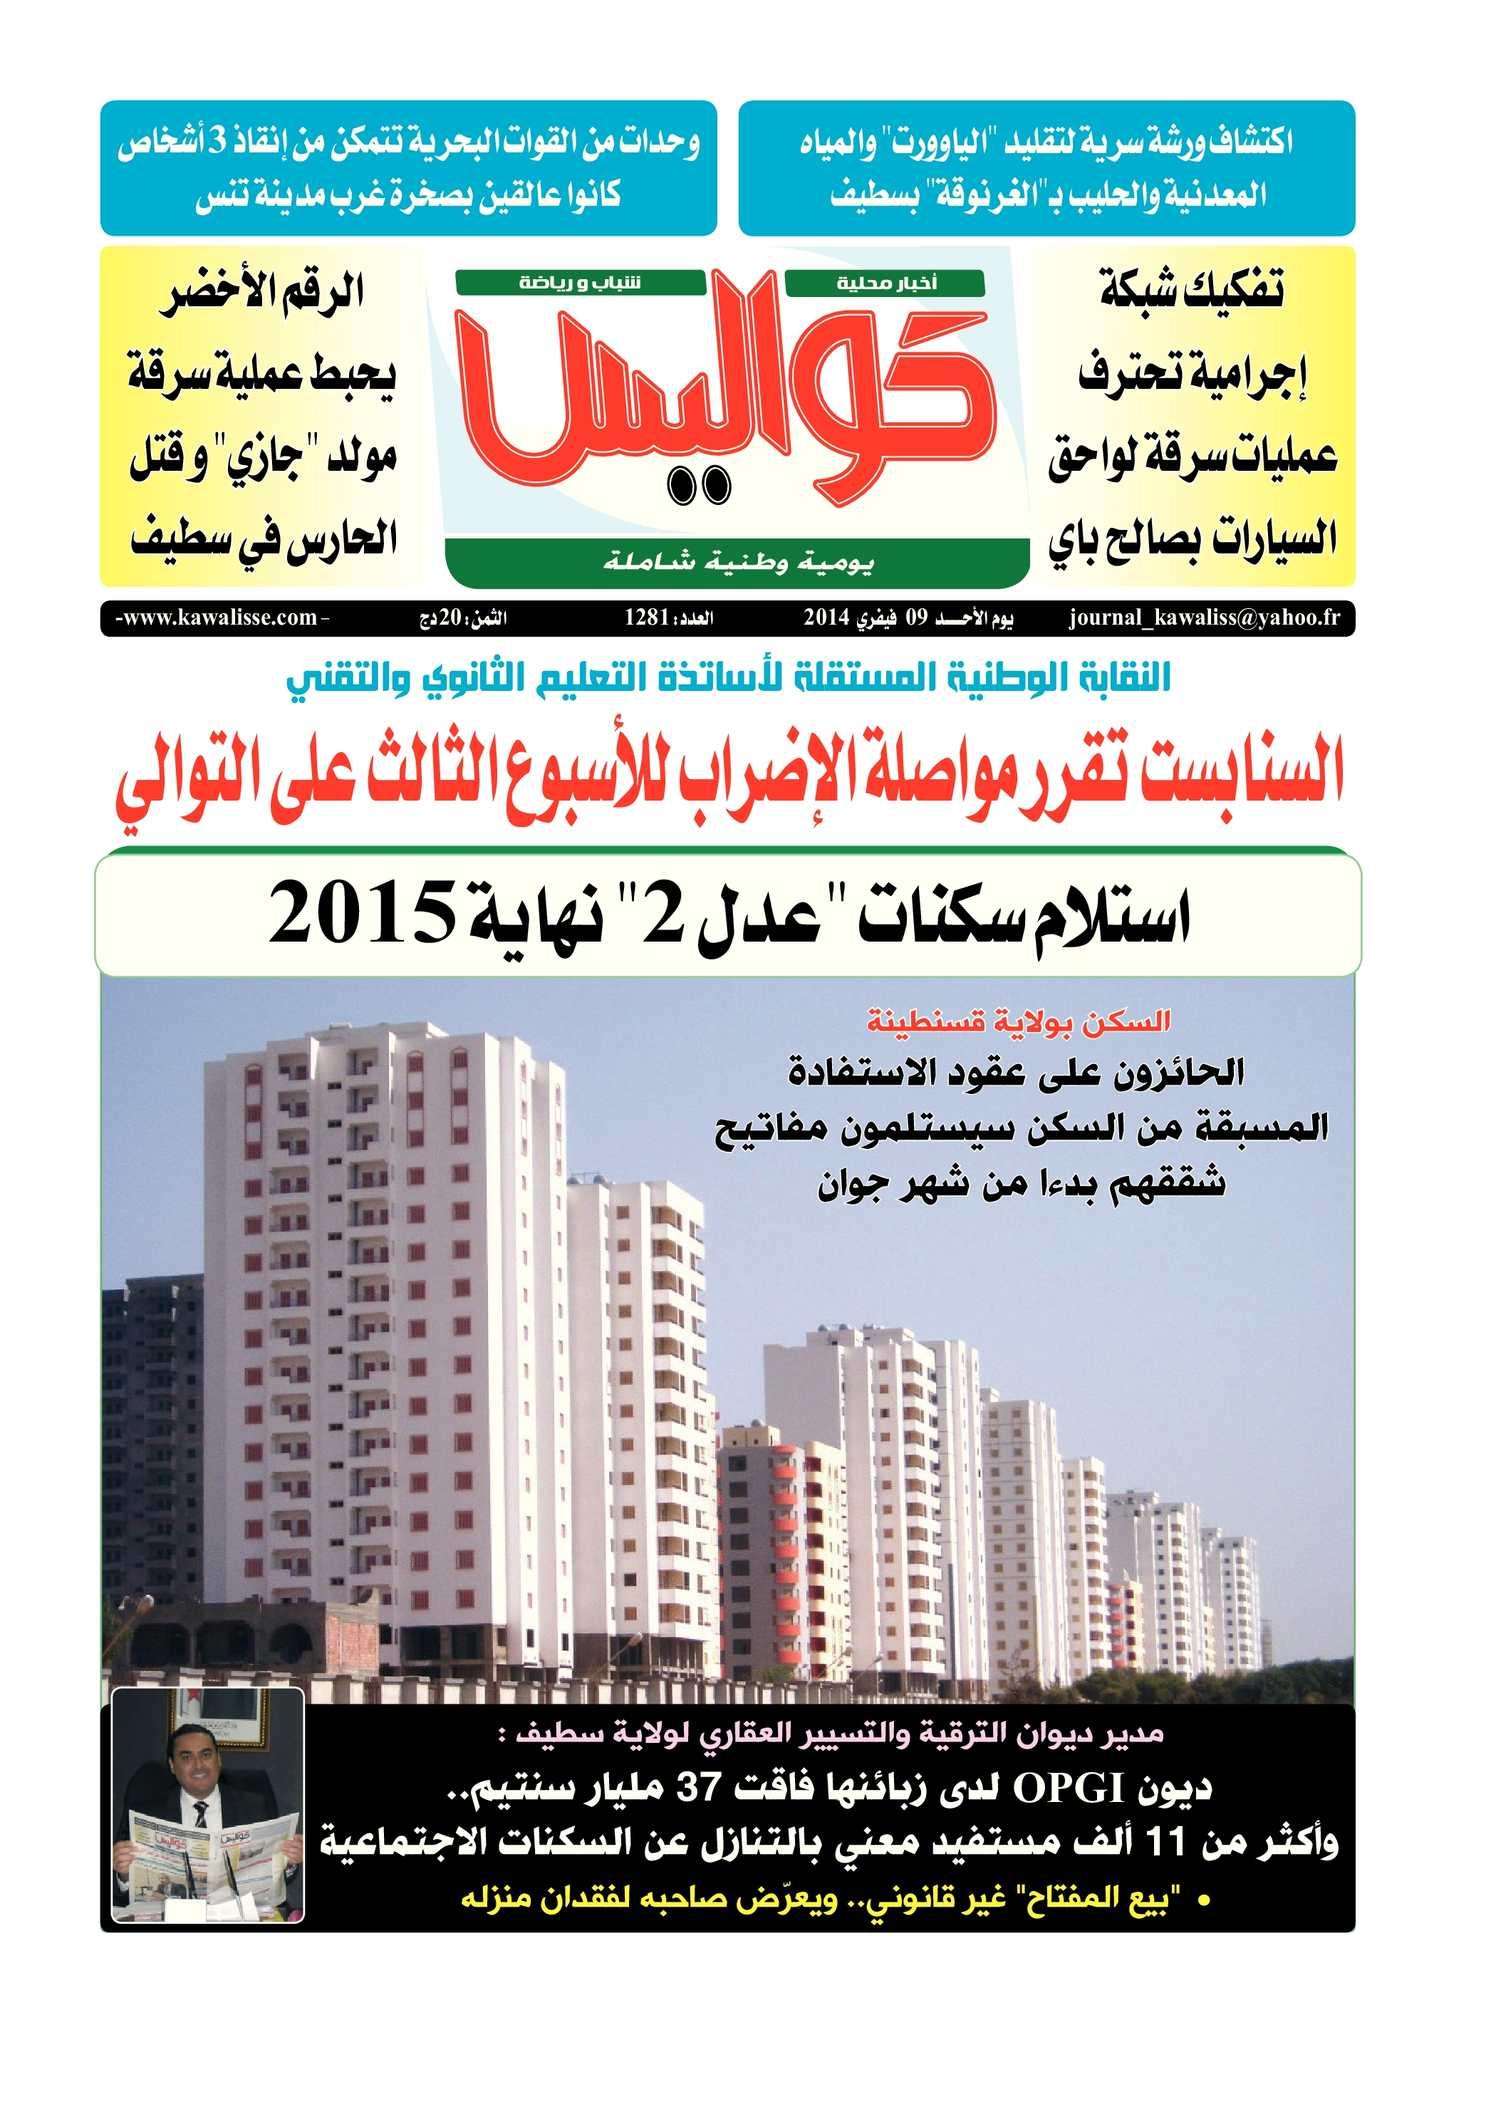 Calaméo Journal Kawaliss N1281